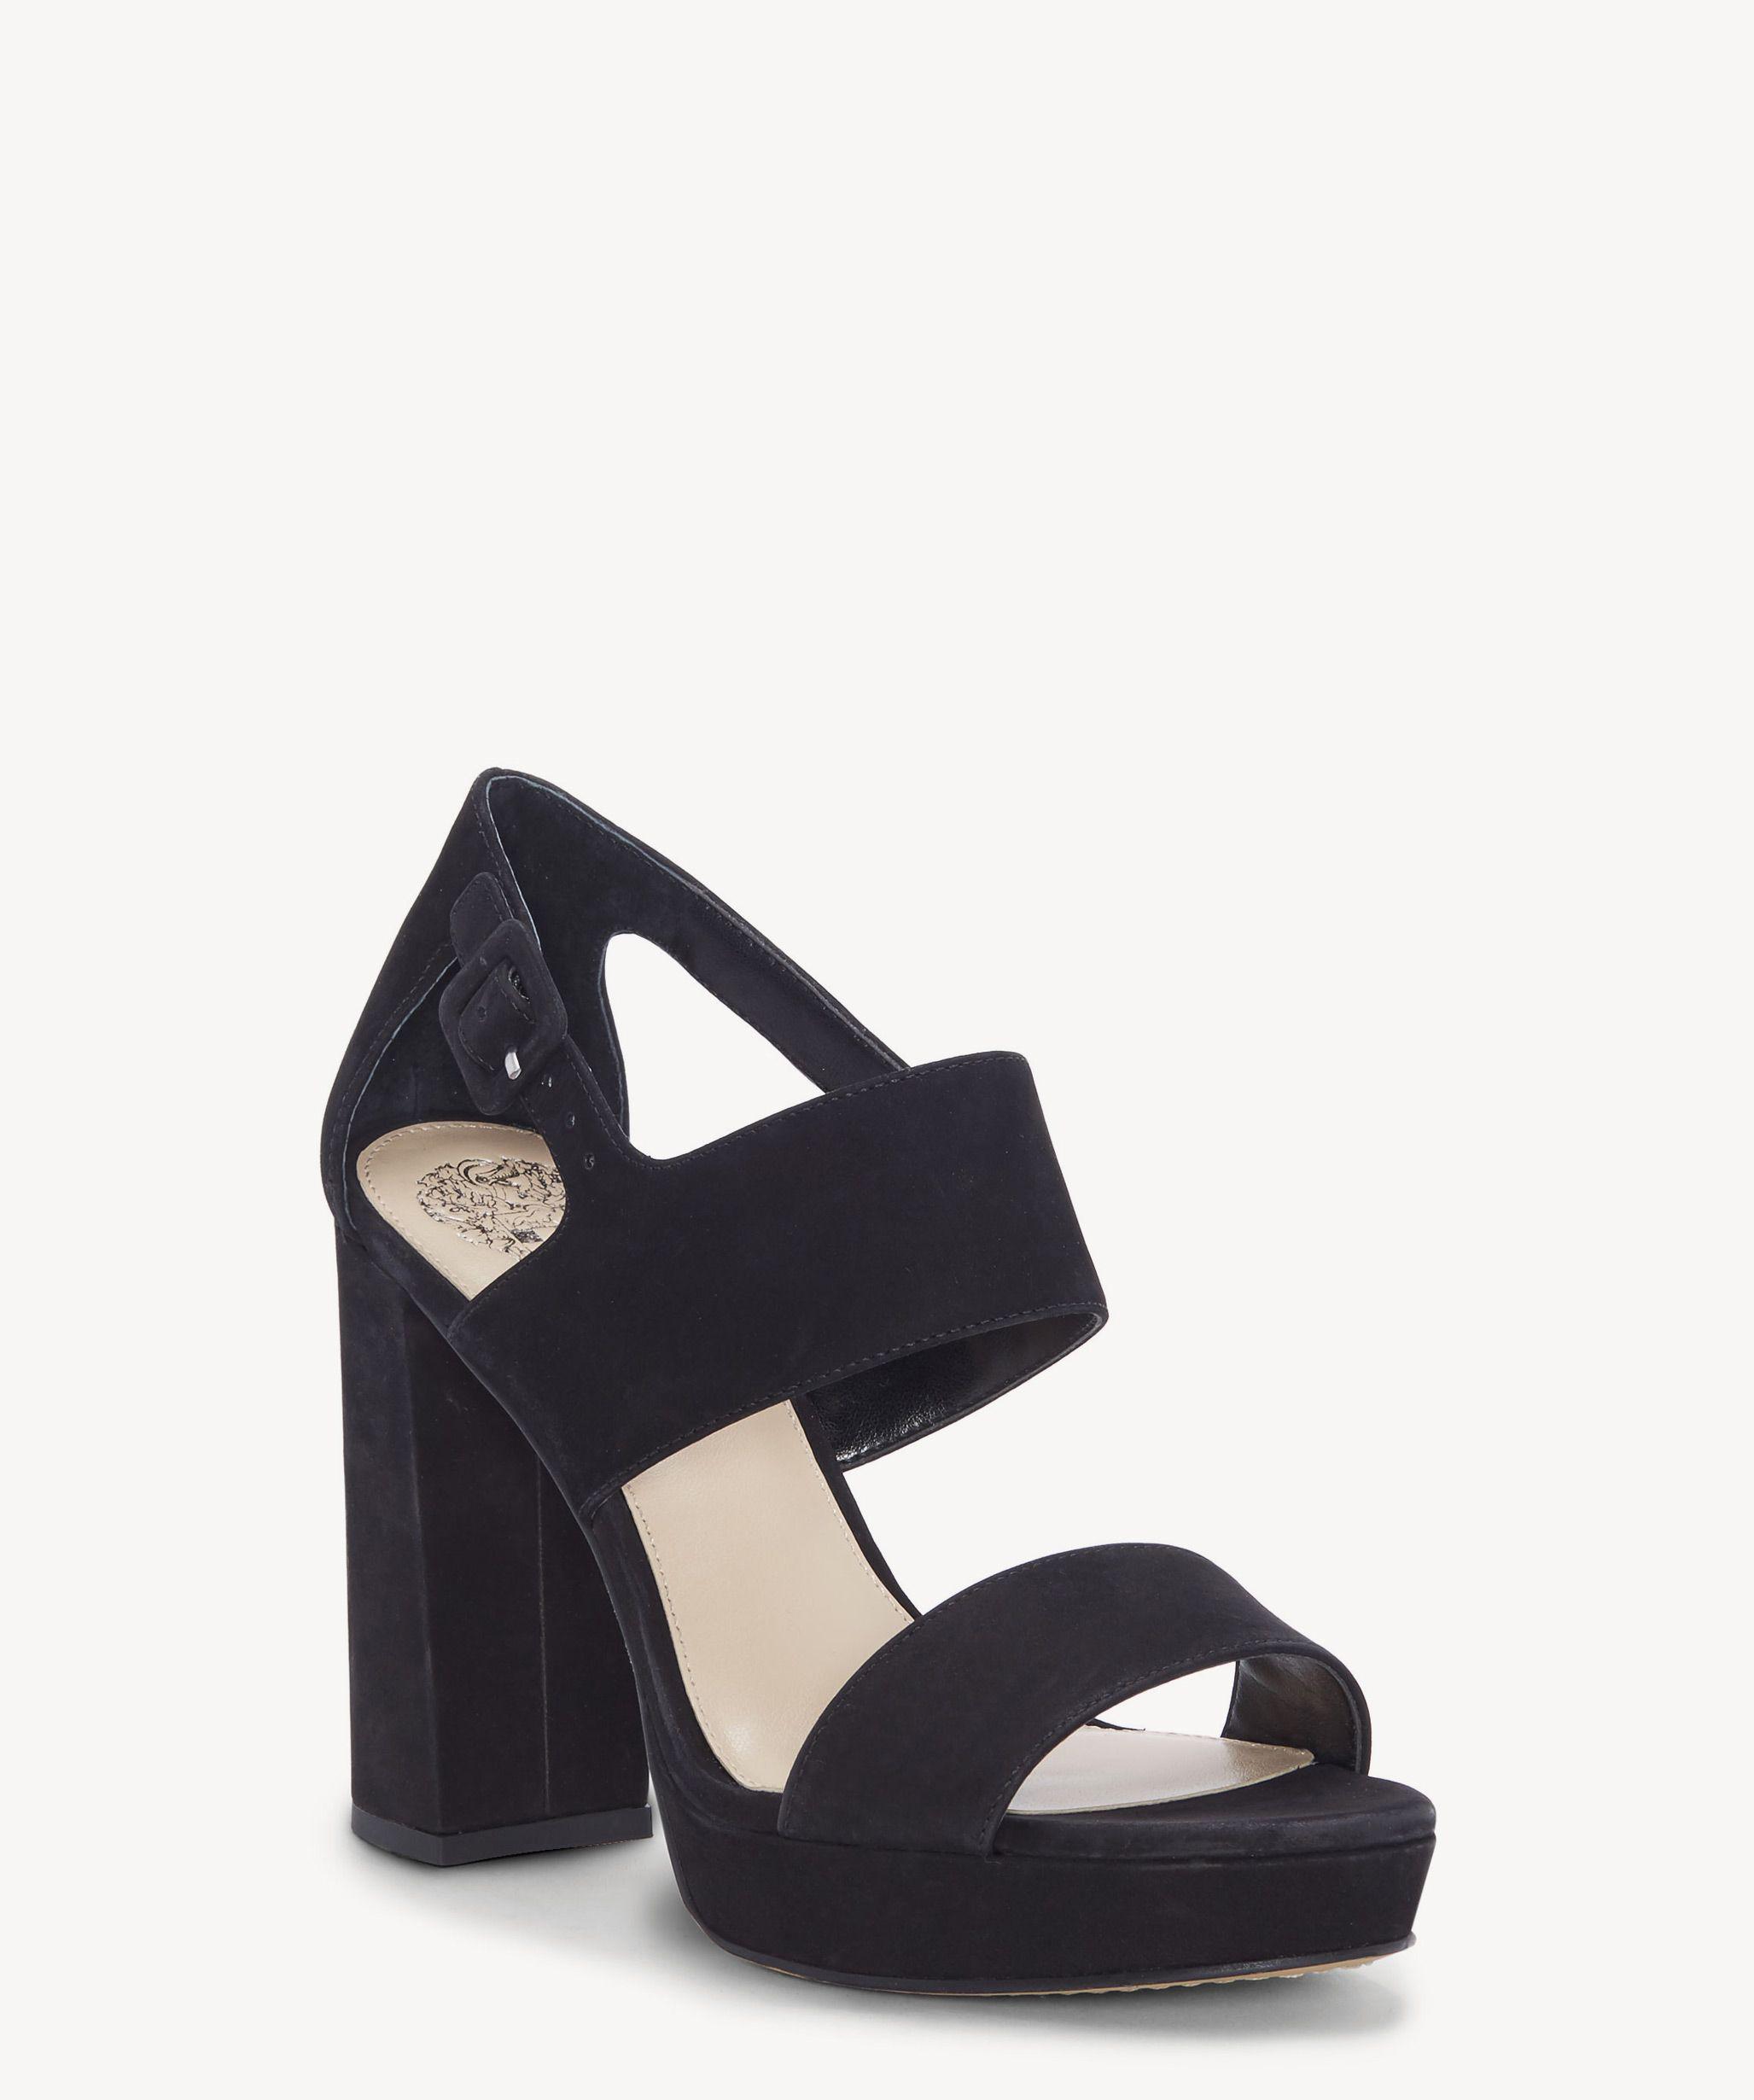 dcbec8a84e5 Lyst - Vince Camuto Jayvid Block Heel Sandal in Black - Save 50%